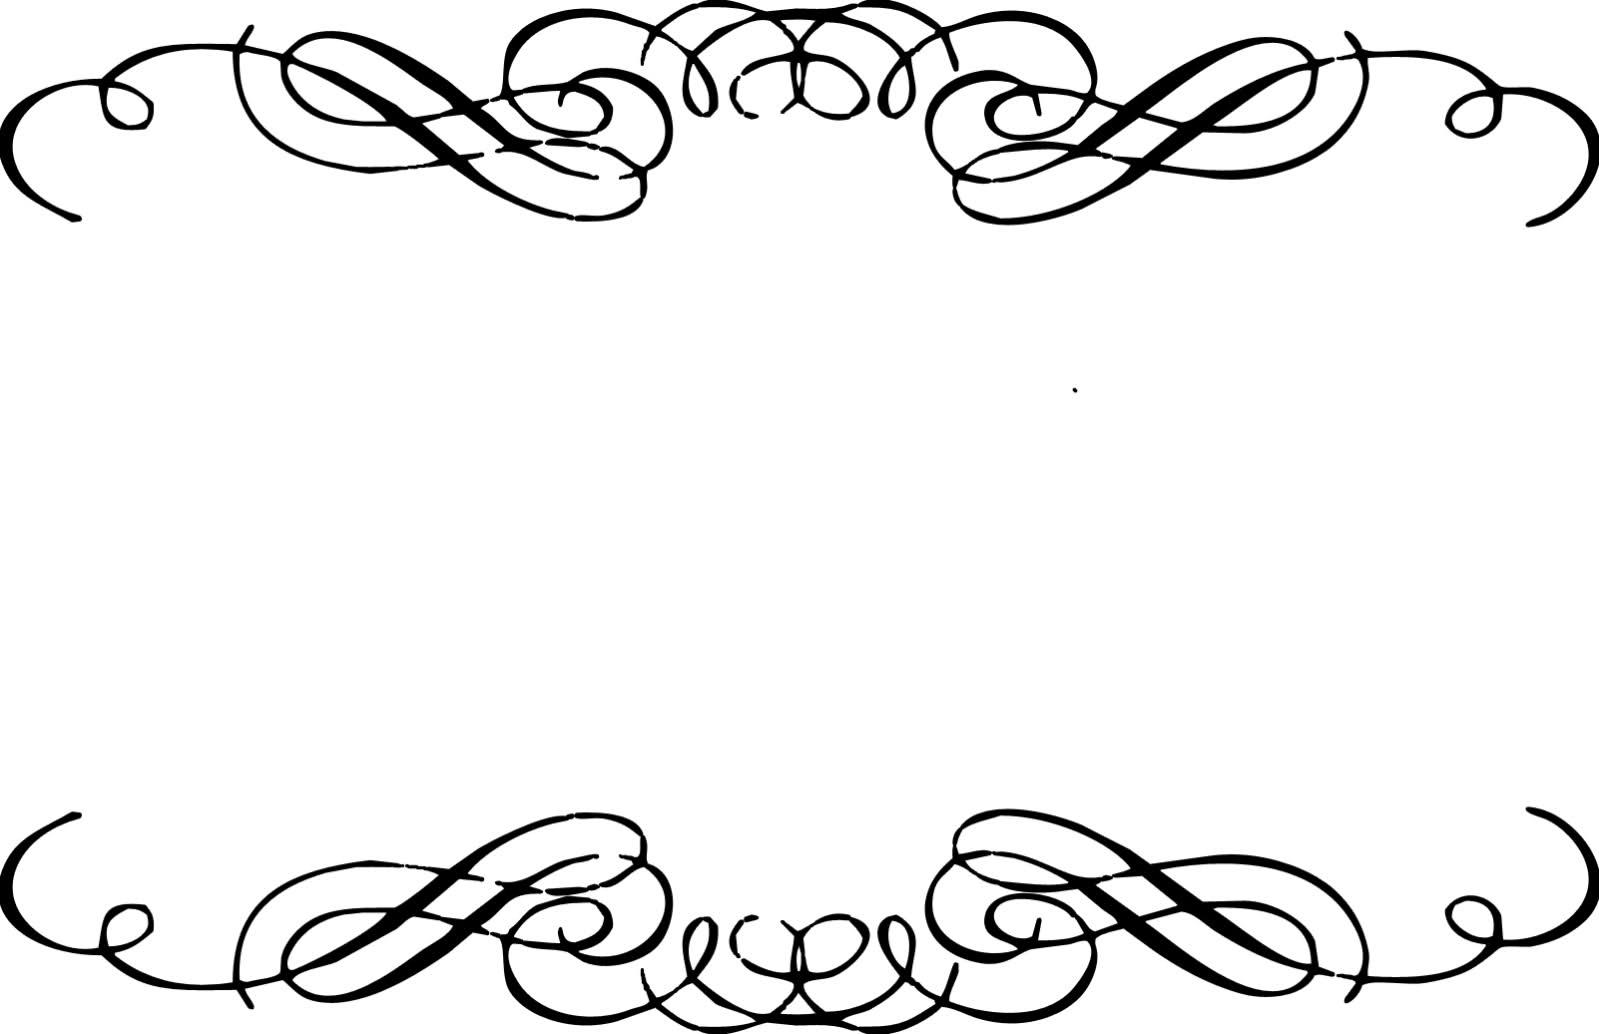 11 Corner Flourish Free Vector Free Clip-11 Corner Flourish Free Vector Free Cliparts That You Can Download To-7